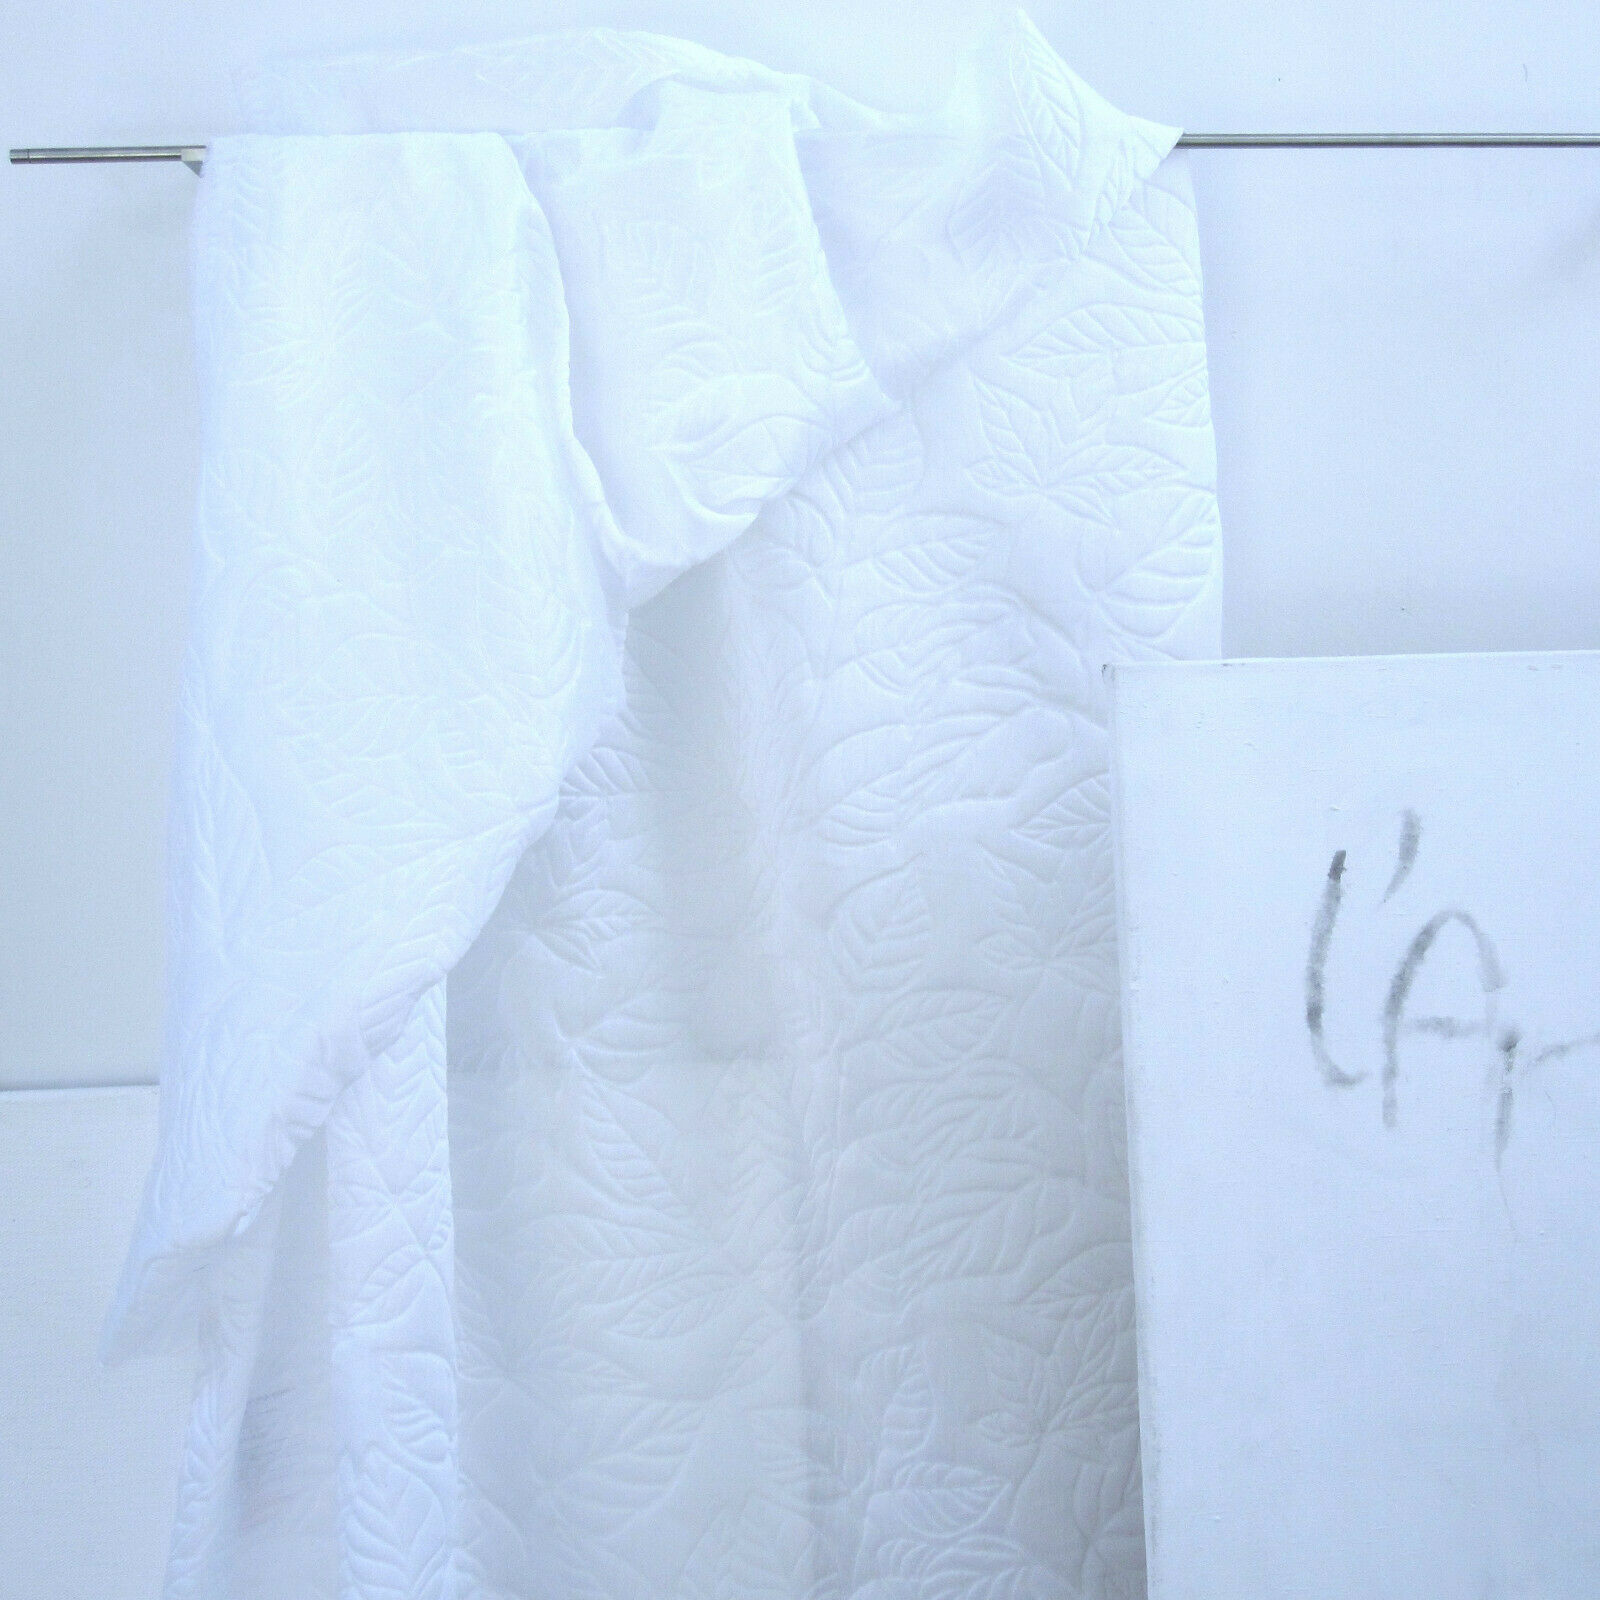 stoffdesign  FOGLIA  Meterware fabric Leinen weiss 3,20 Meter hoch Nya Nordiska